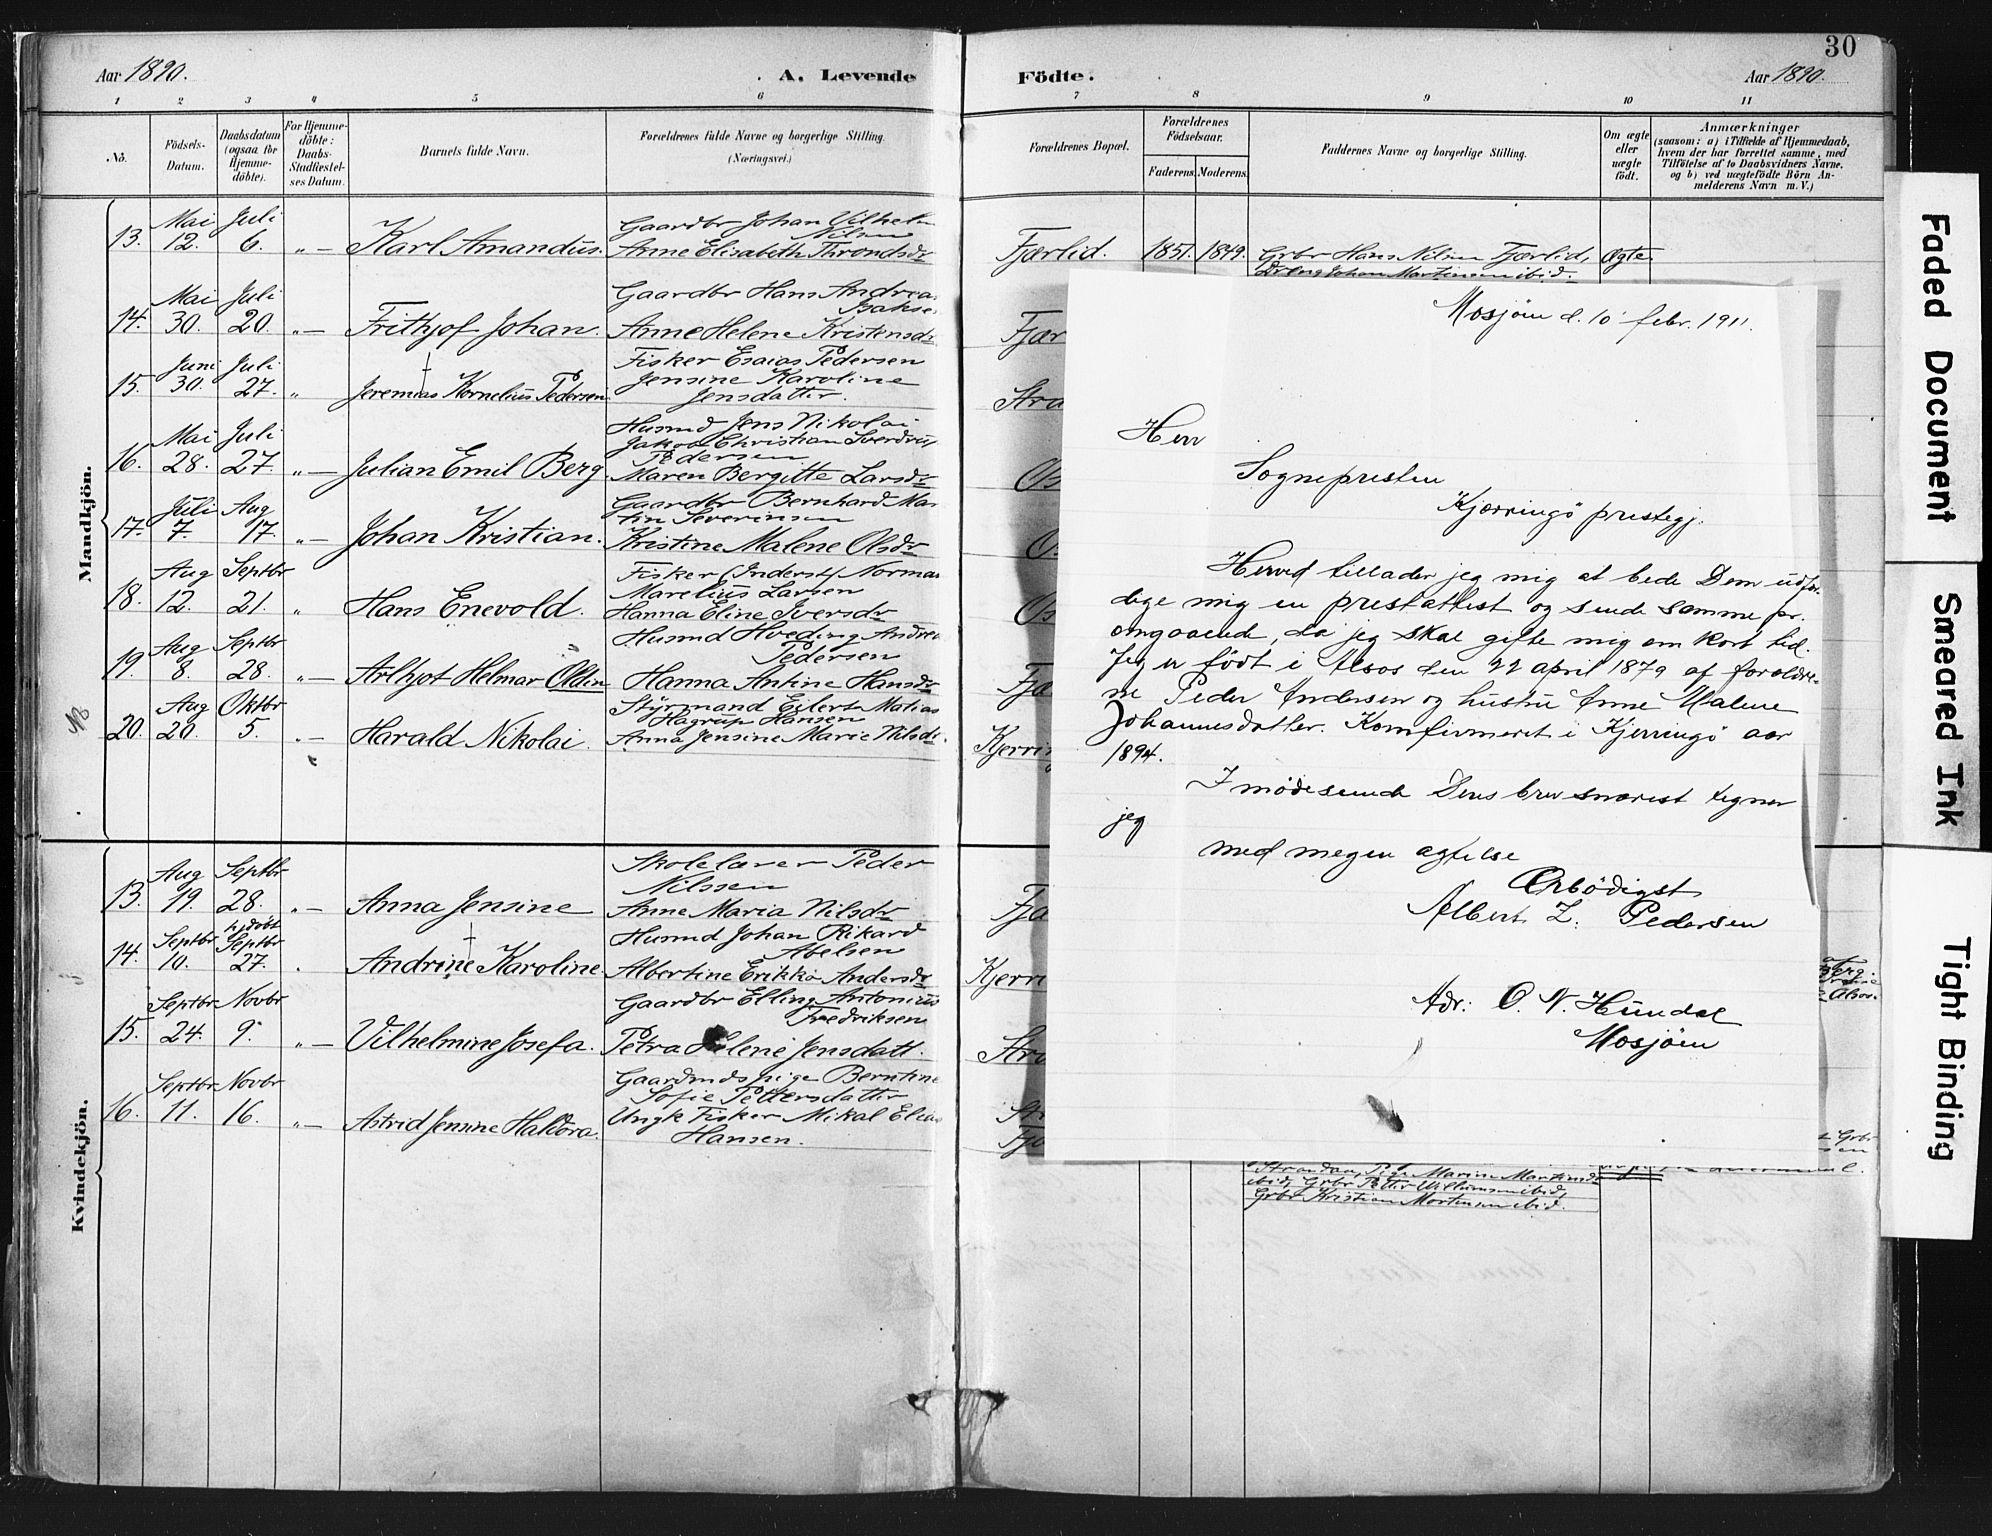 SAT, Ministerialprotokoller, klokkerbøker og fødselsregistre - Nordland, 803/L0071: Ministerialbok nr. 803A01, 1881-1897, s. 30